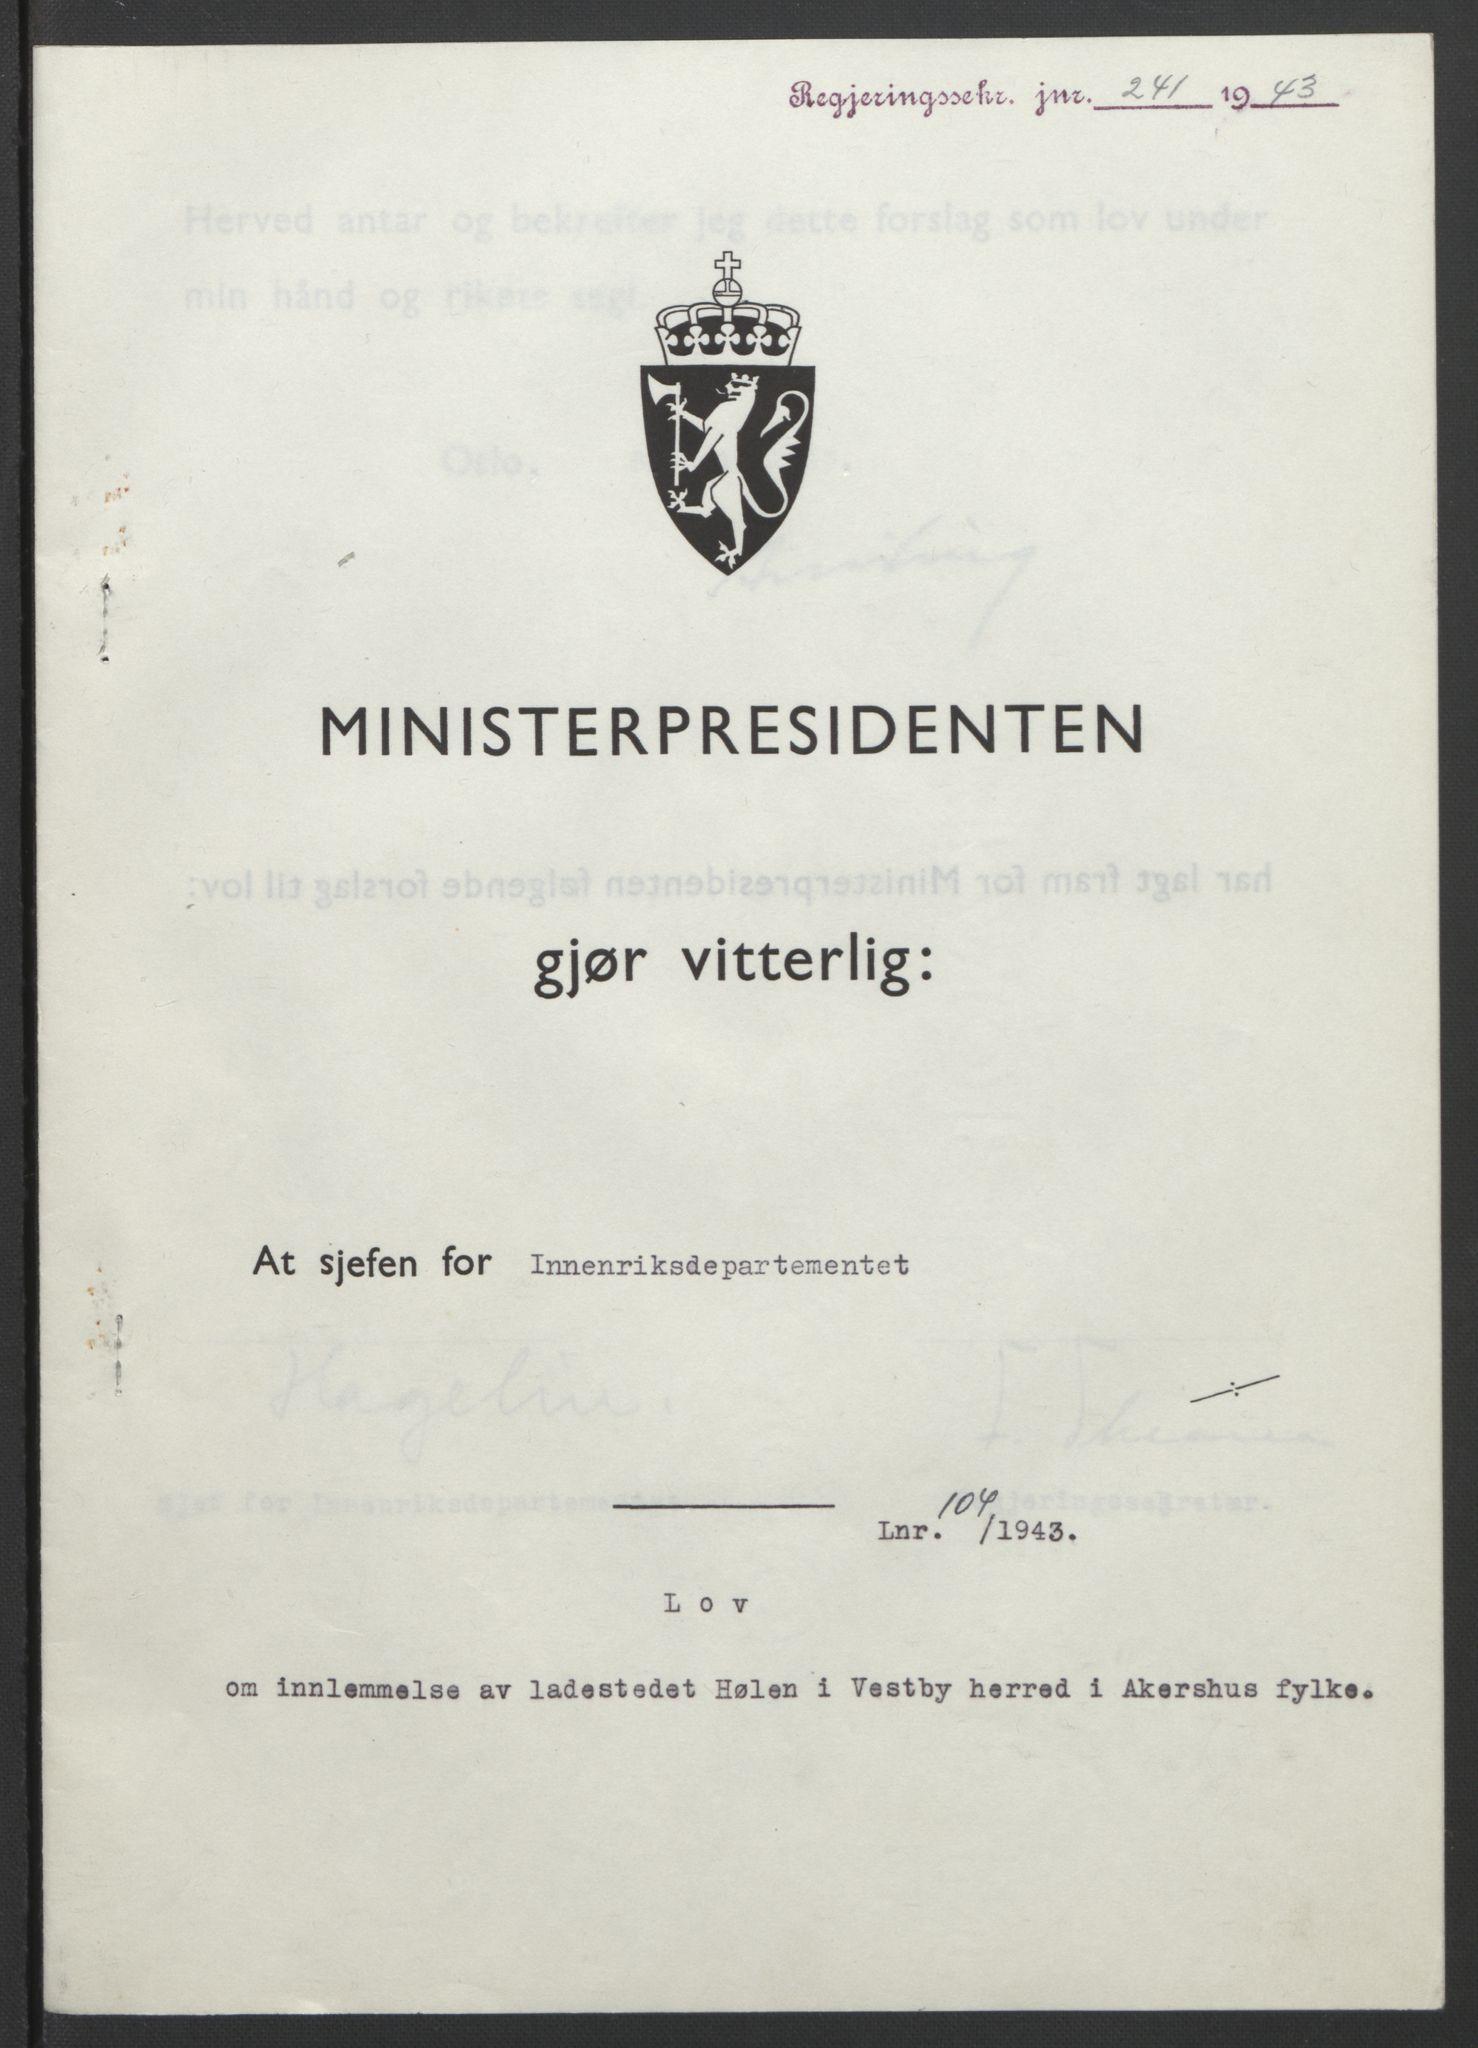 RA, NS-administrasjonen 1940-1945 (Statsrådsekretariatet, de kommisariske statsråder mm), D/Db/L0099: Lover, 1943, s. 482